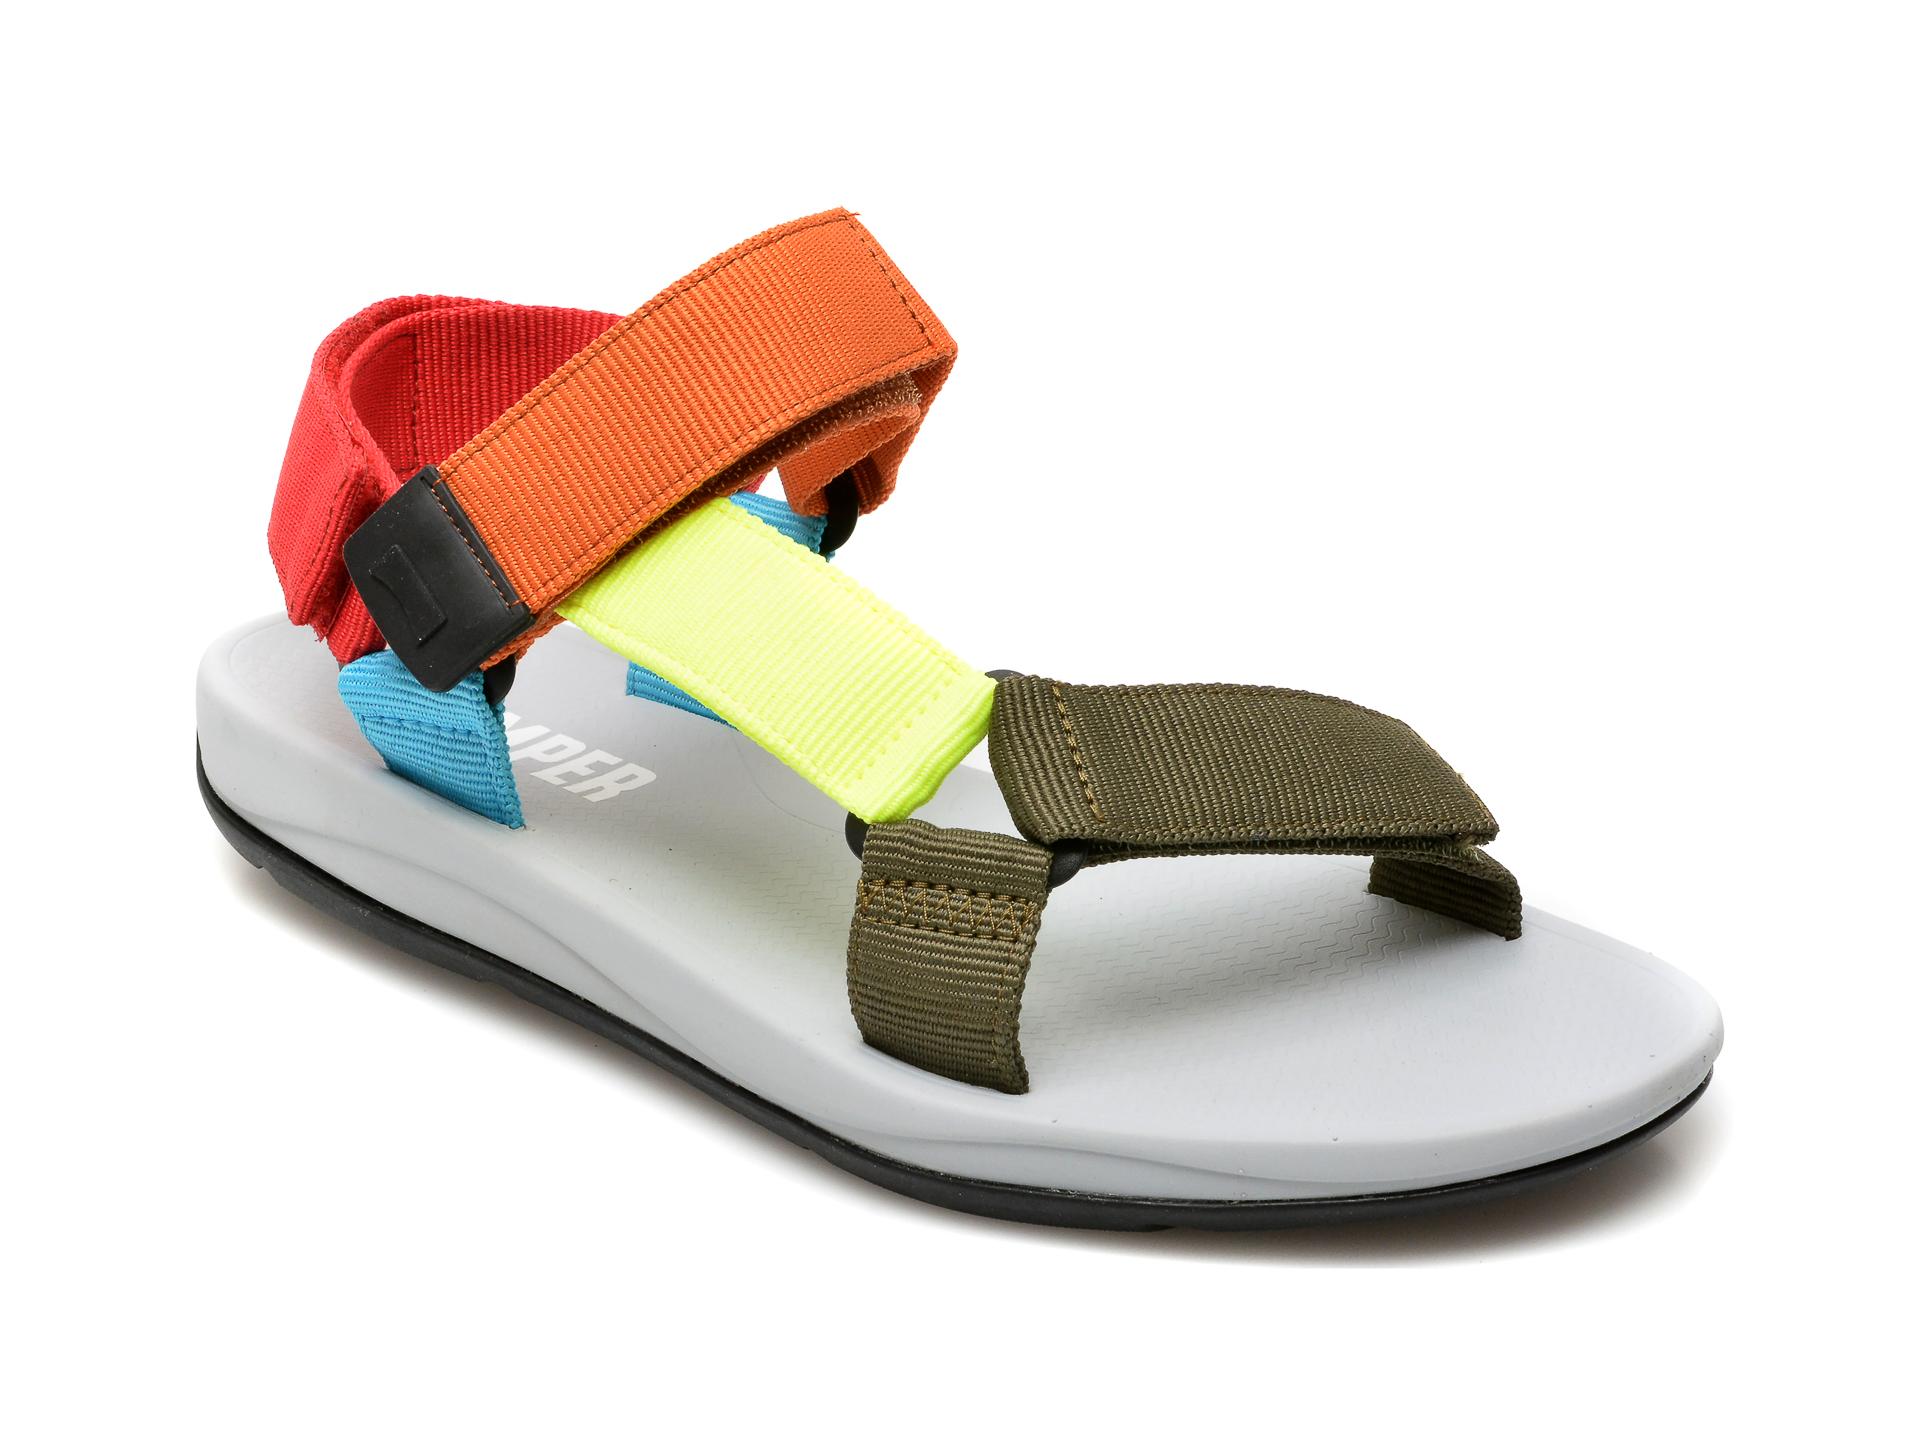 Sandale CAMPER multicolore, K100539, din material textil New